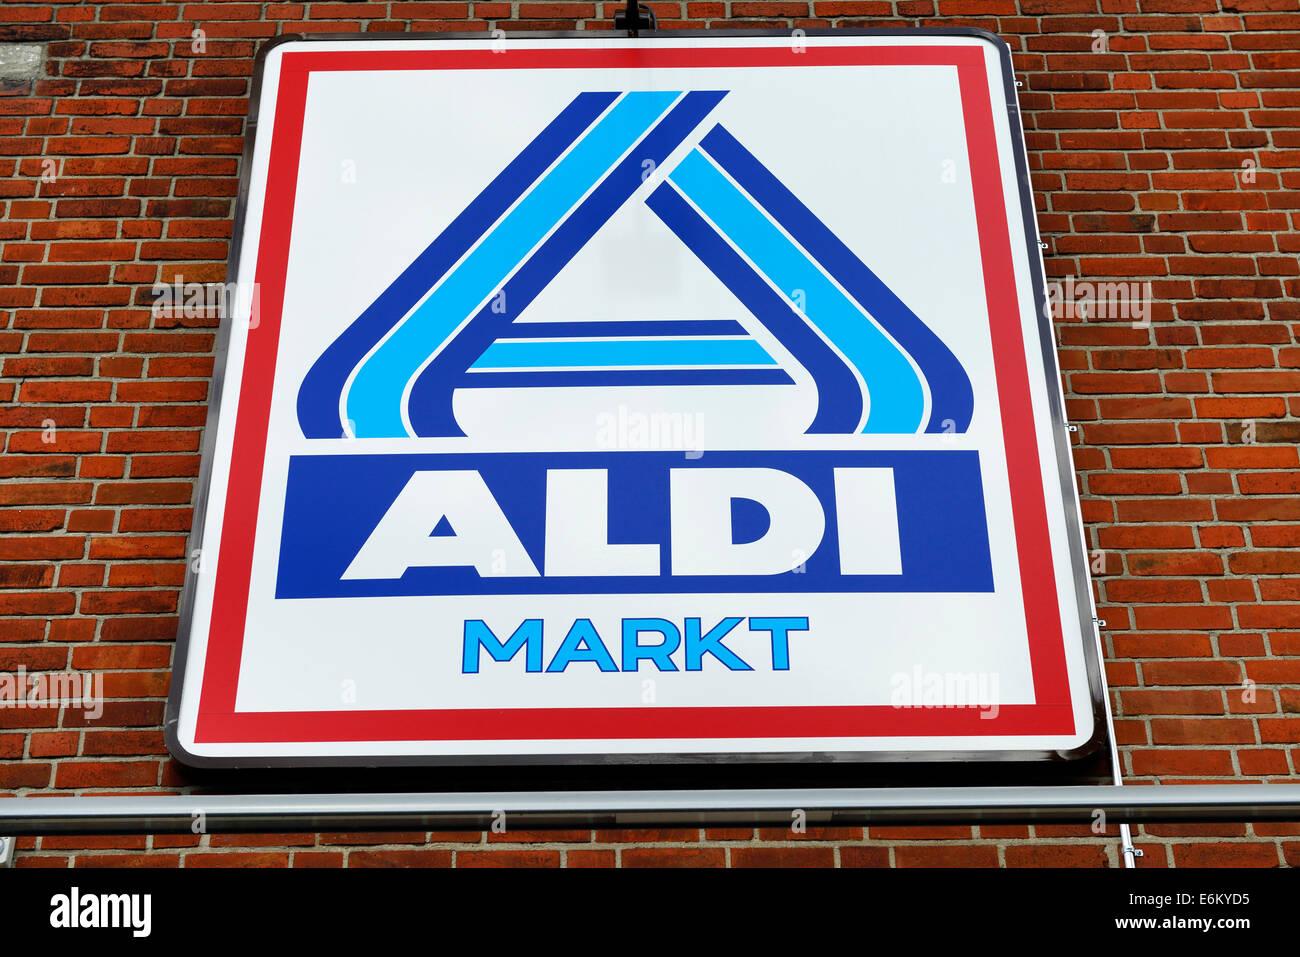 Schild des Lebensmittel-Discounters Aldi - Stock Image